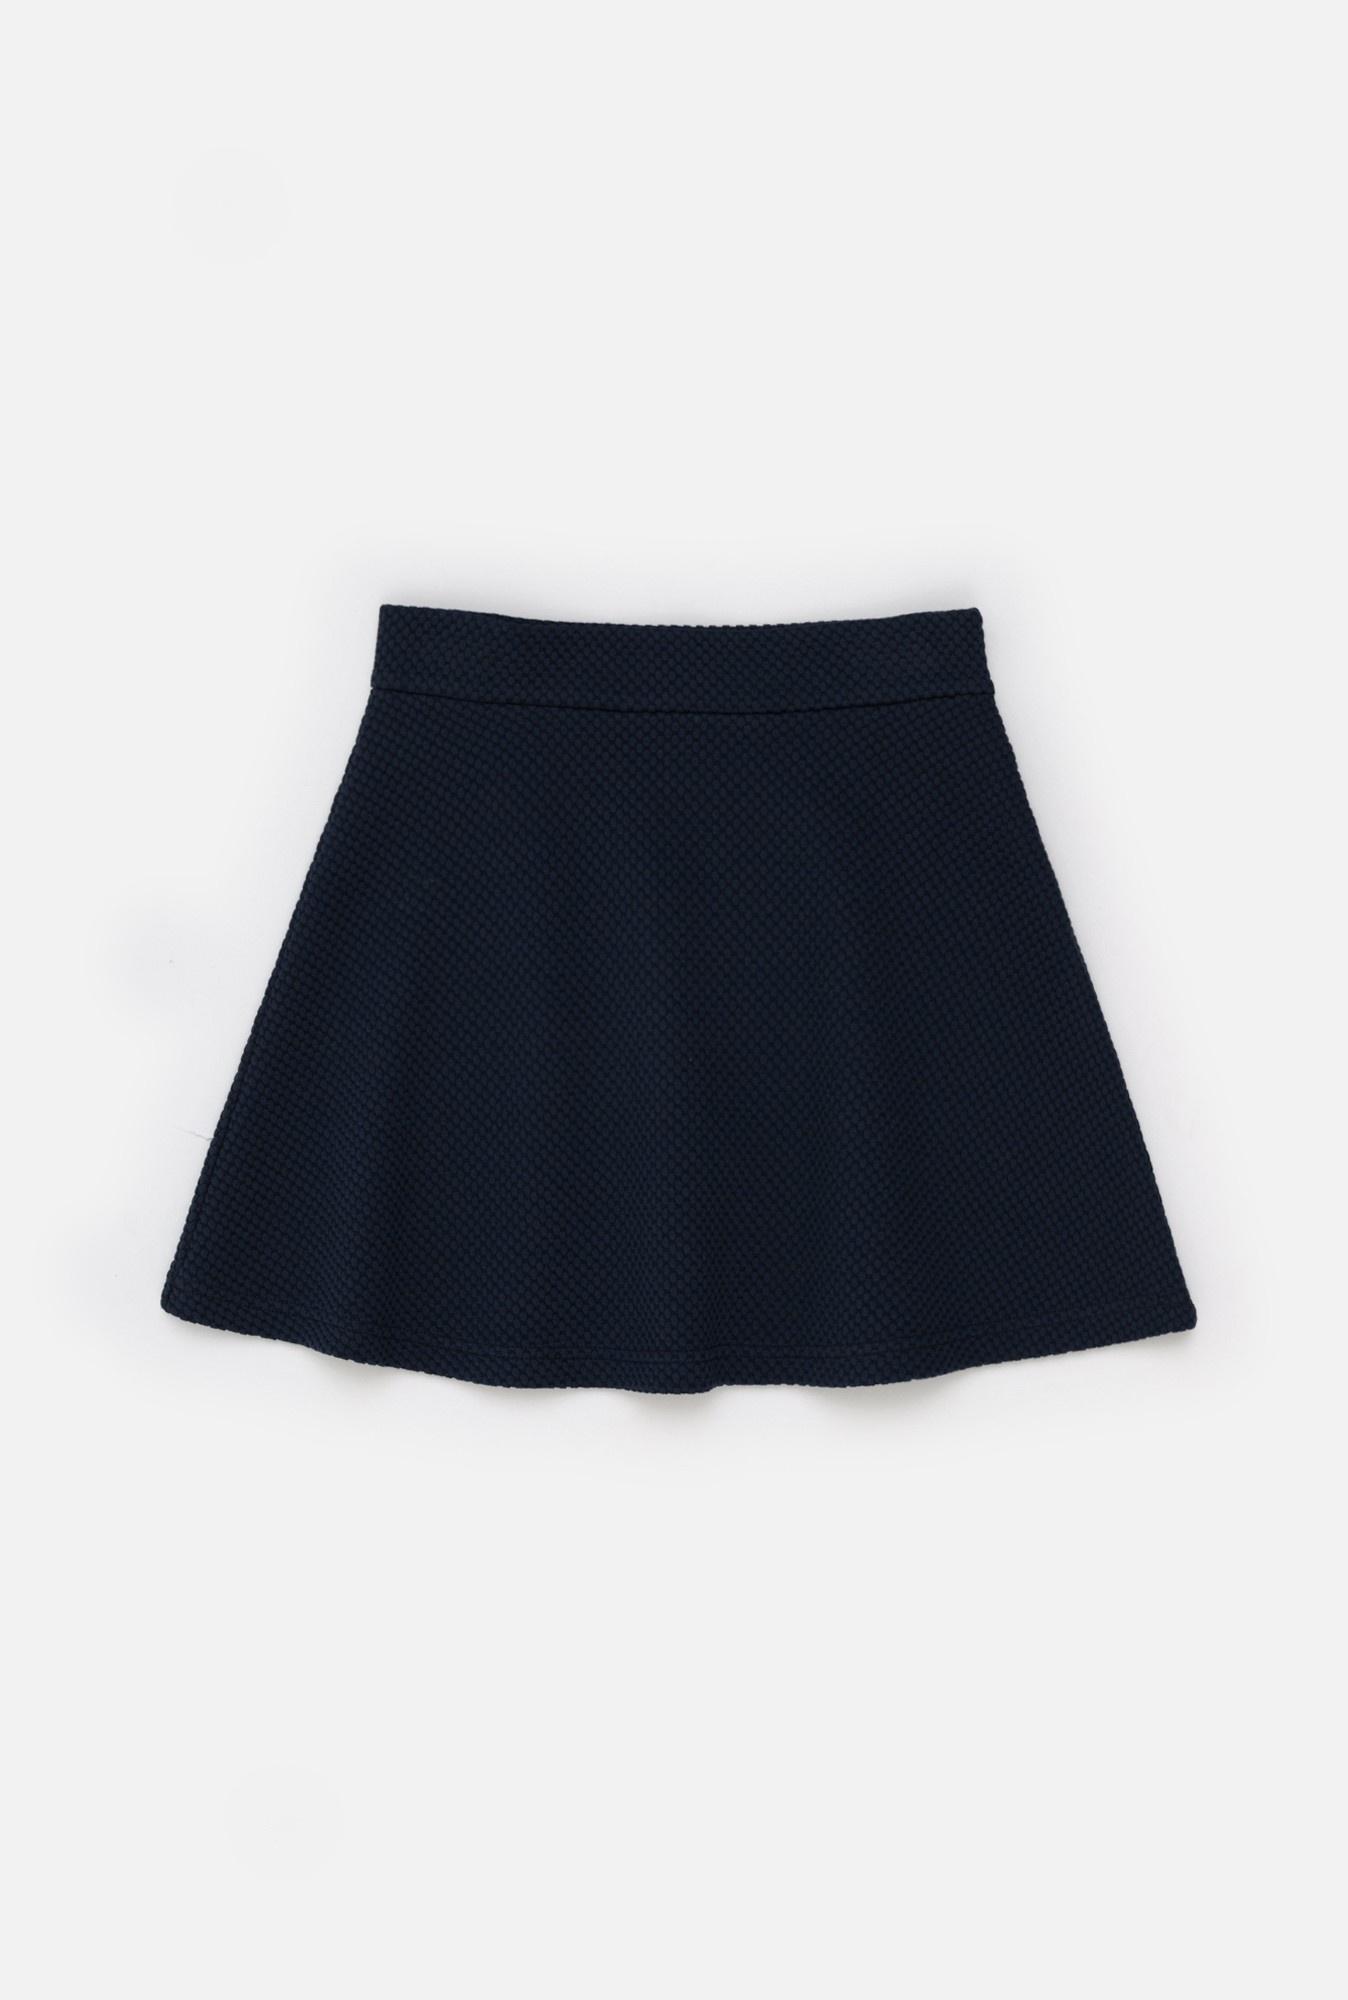 Юбка Concept Club футболка для мальчика concept club stowboard цвет синий 10110110125 610 размер 158